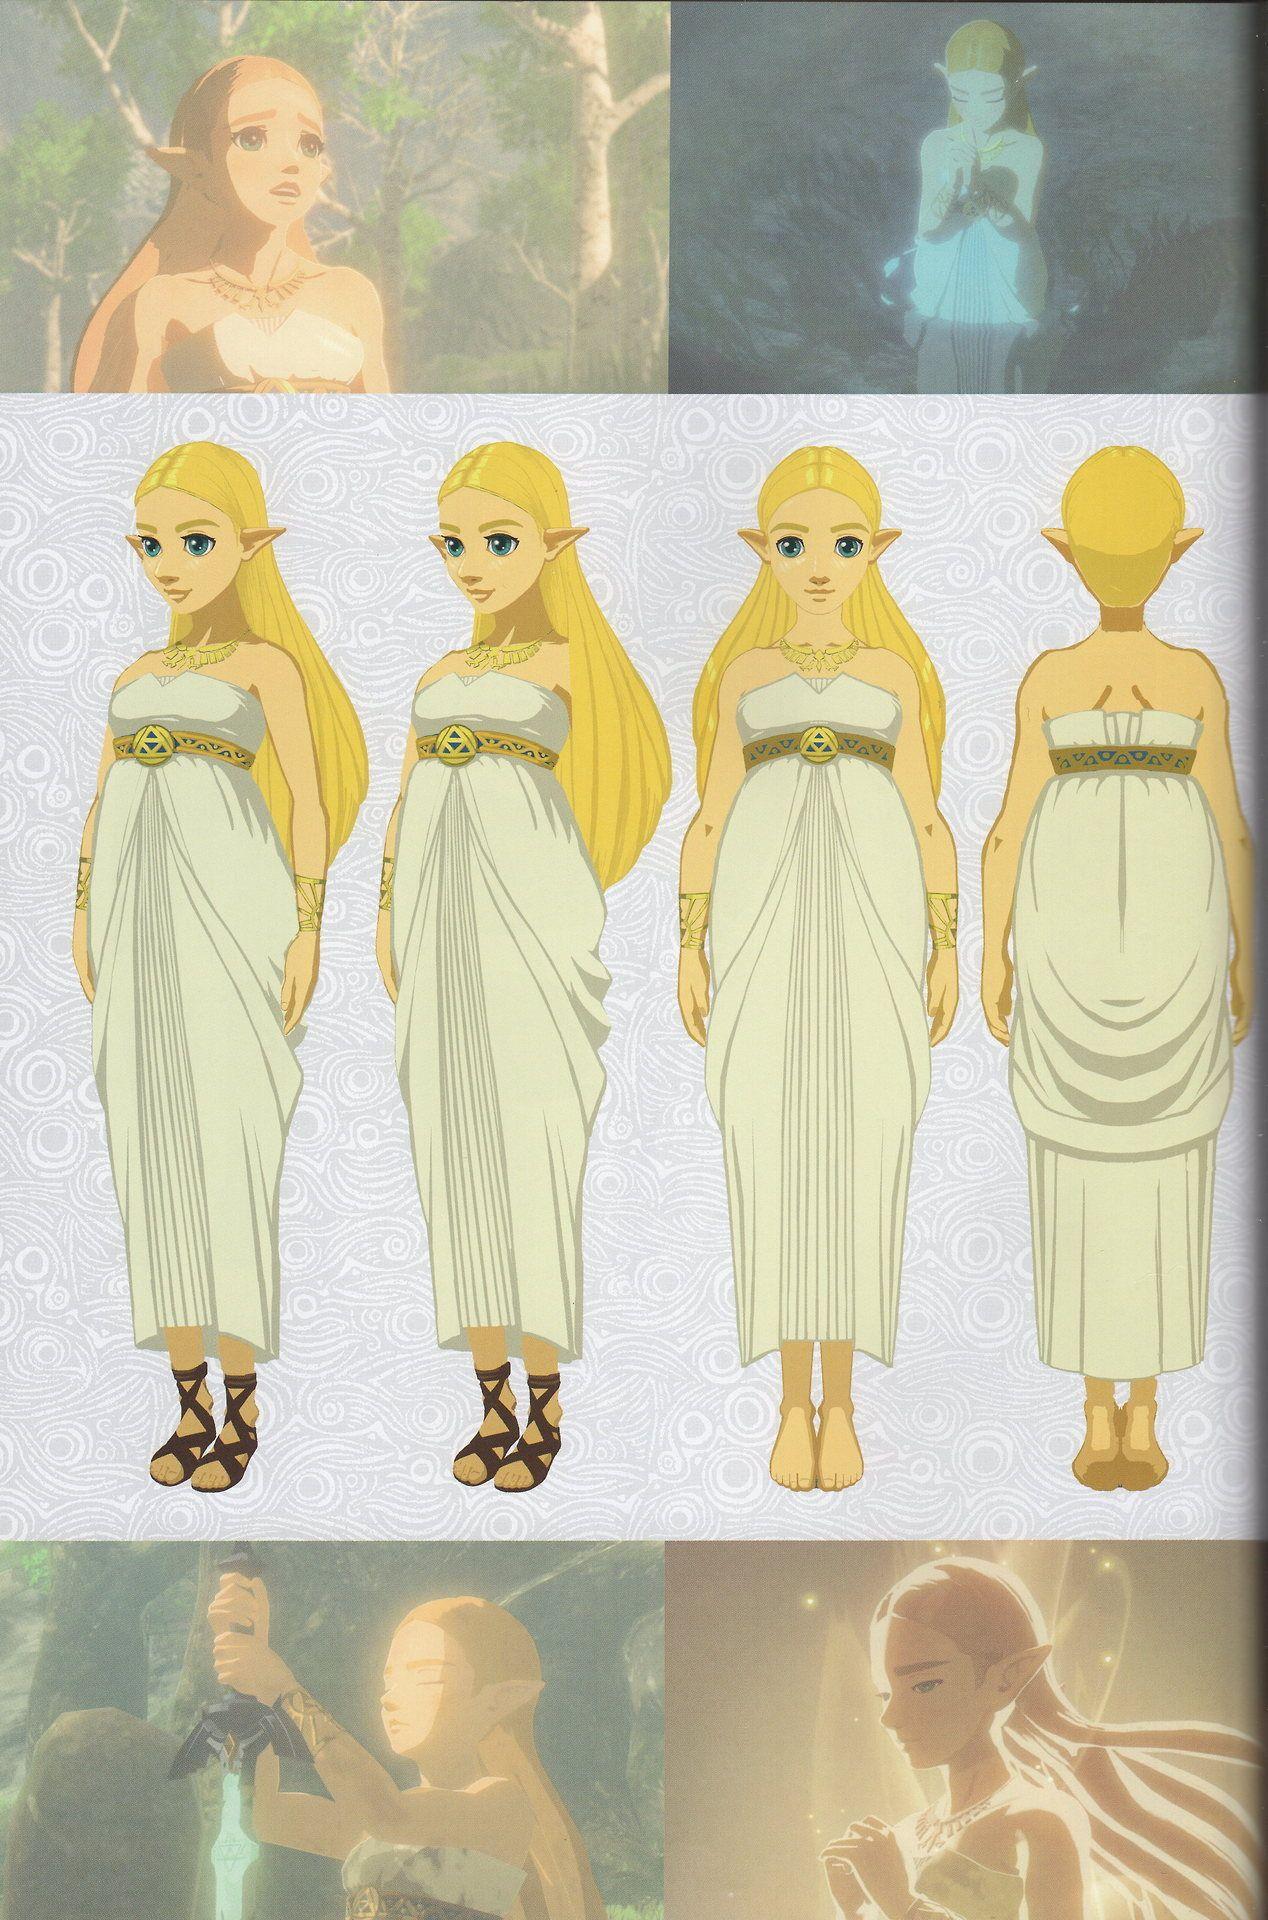 14+ Botw zelda white dress ideas